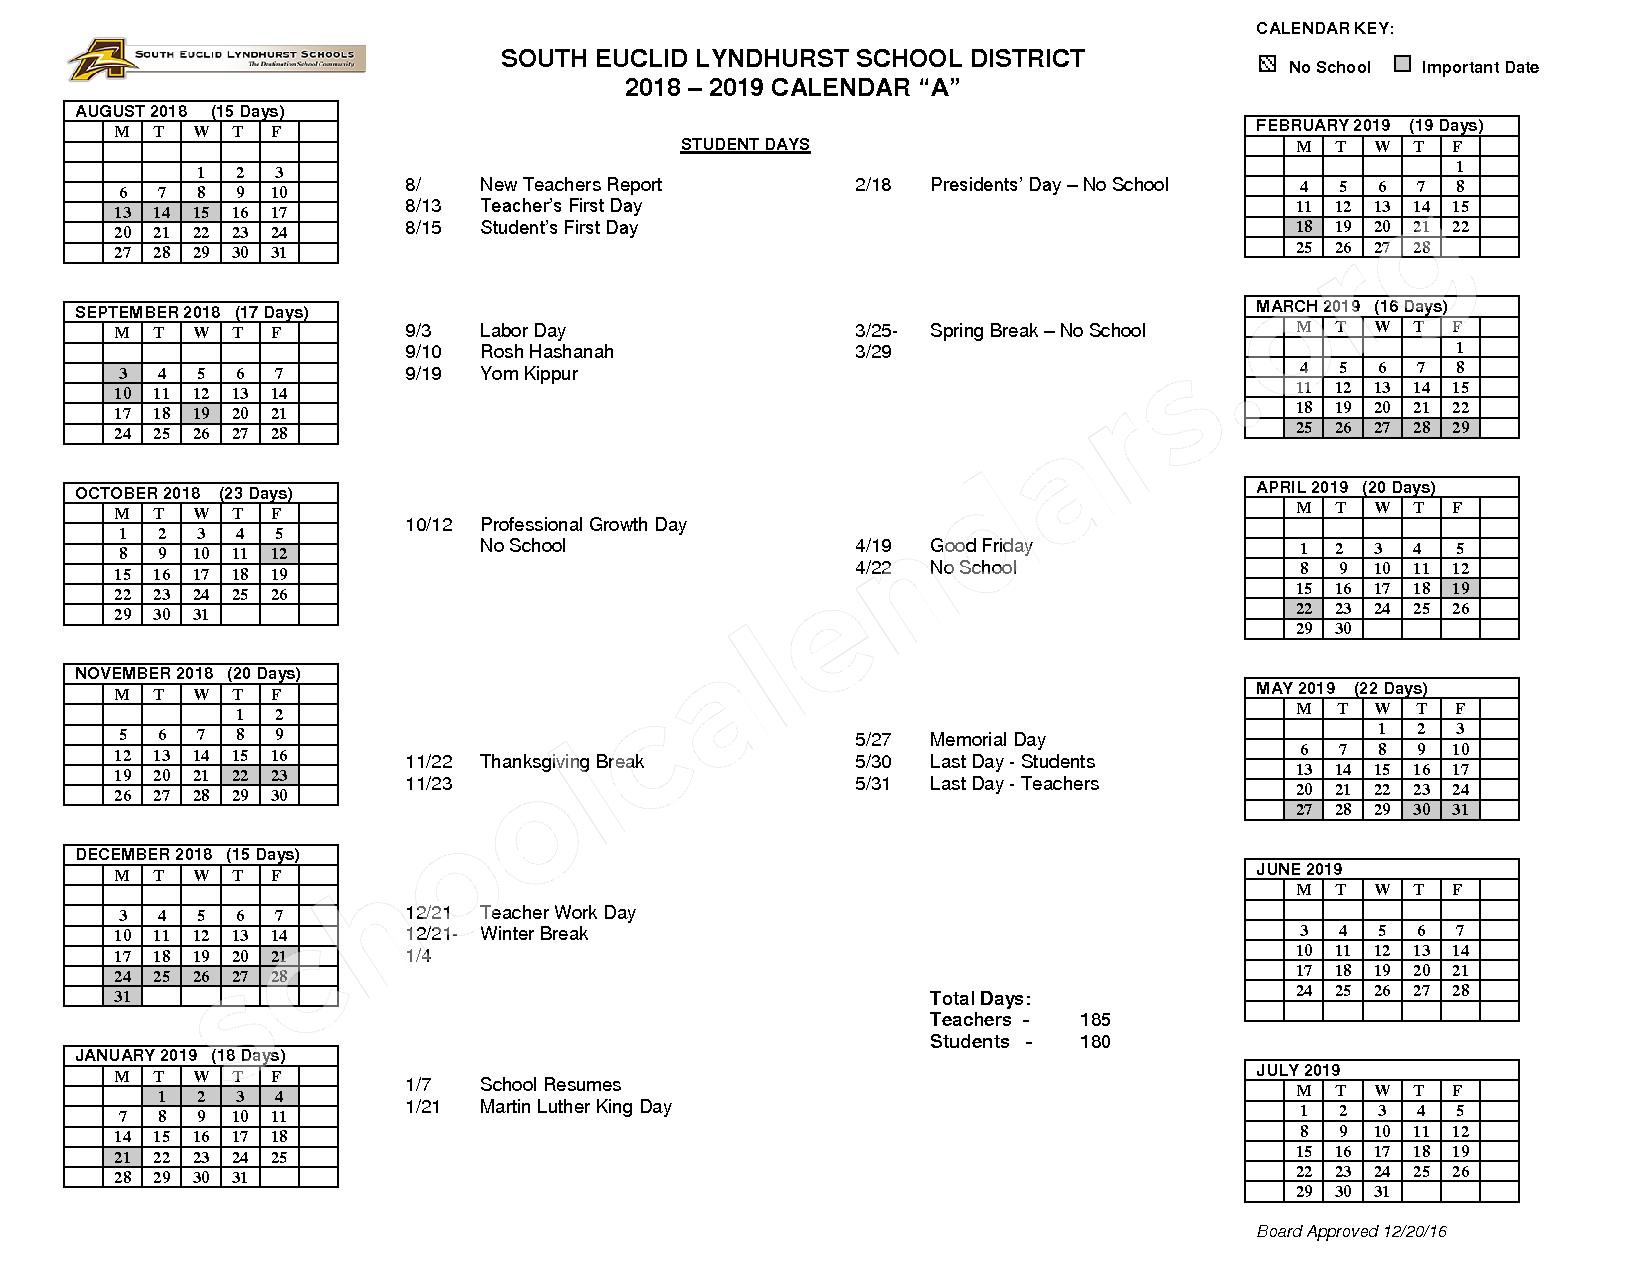 South Euclid Lyndhurst Schools Calendars – Lyndhurst, Oh Throughout South Euclid Lyndhurst Calendar